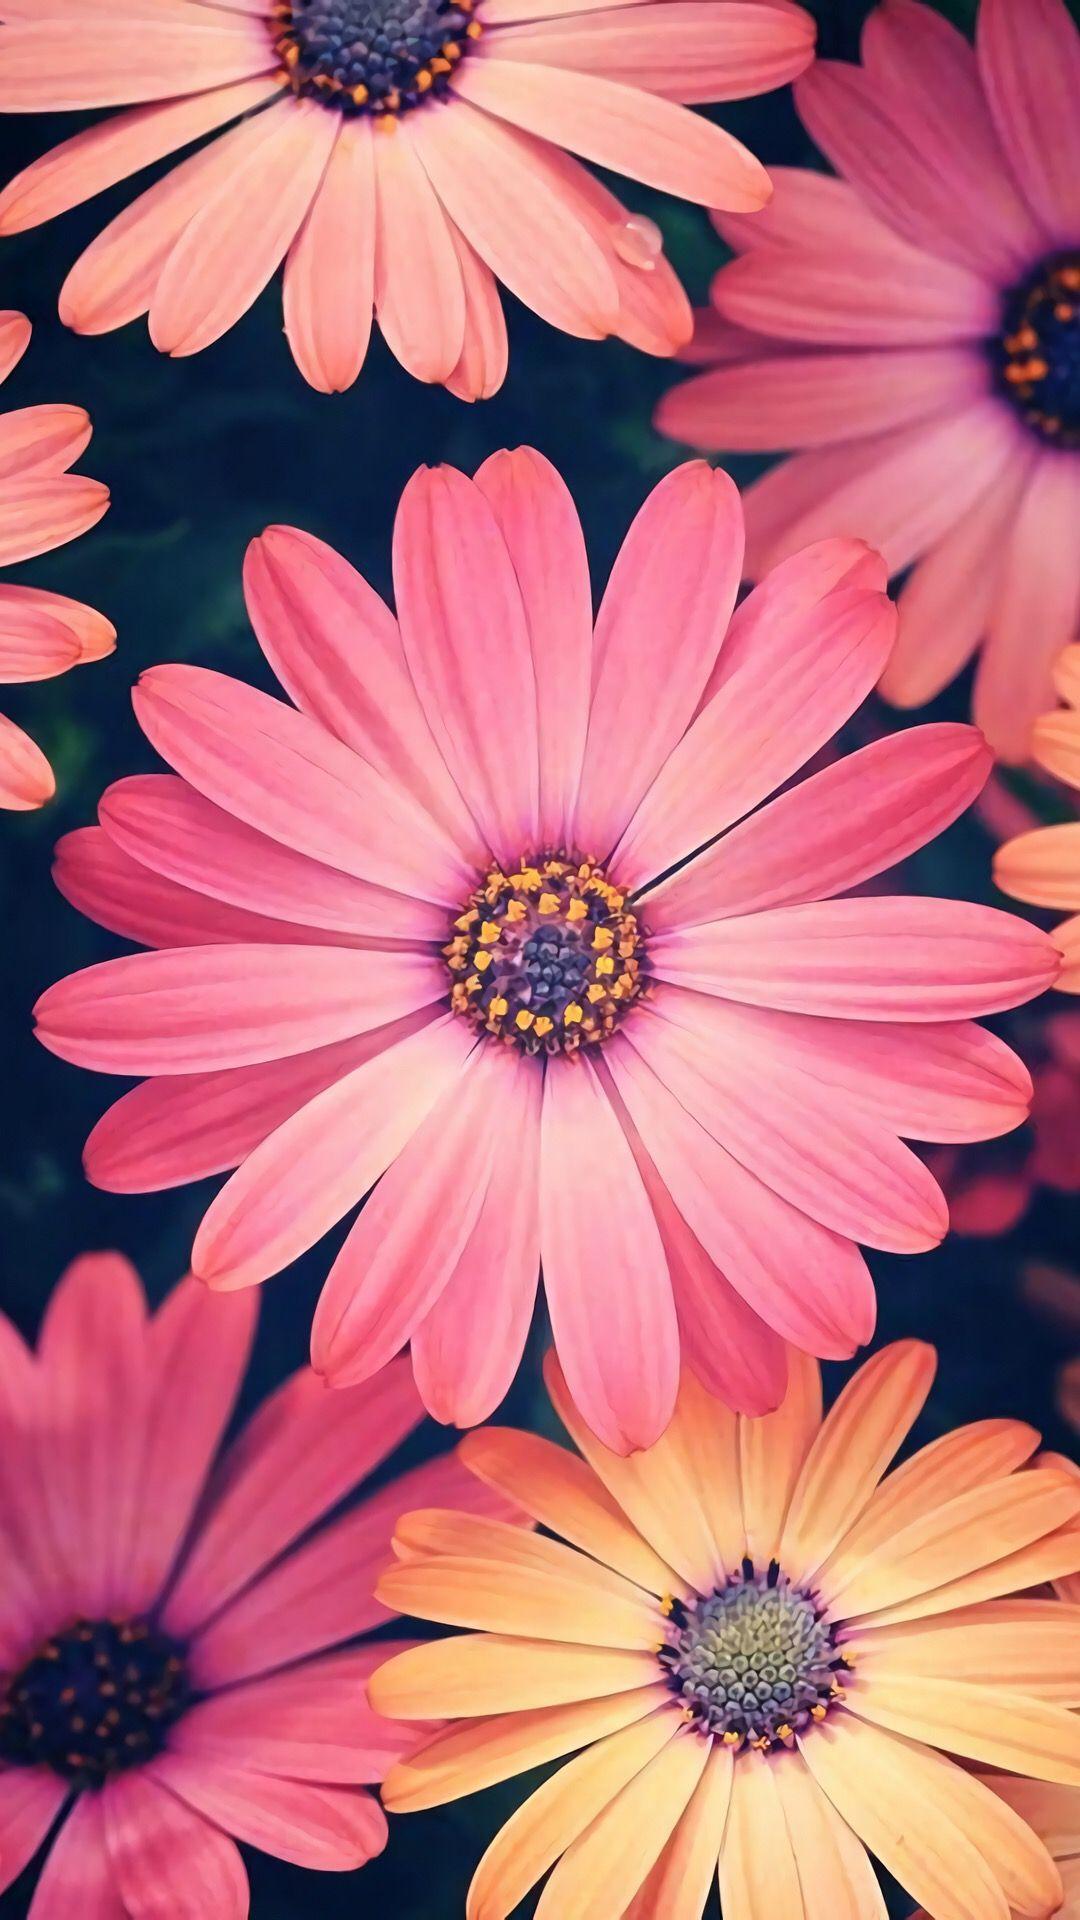 Pin By Angela Ro On Wallpaper Pinterest Flowers Beautiful